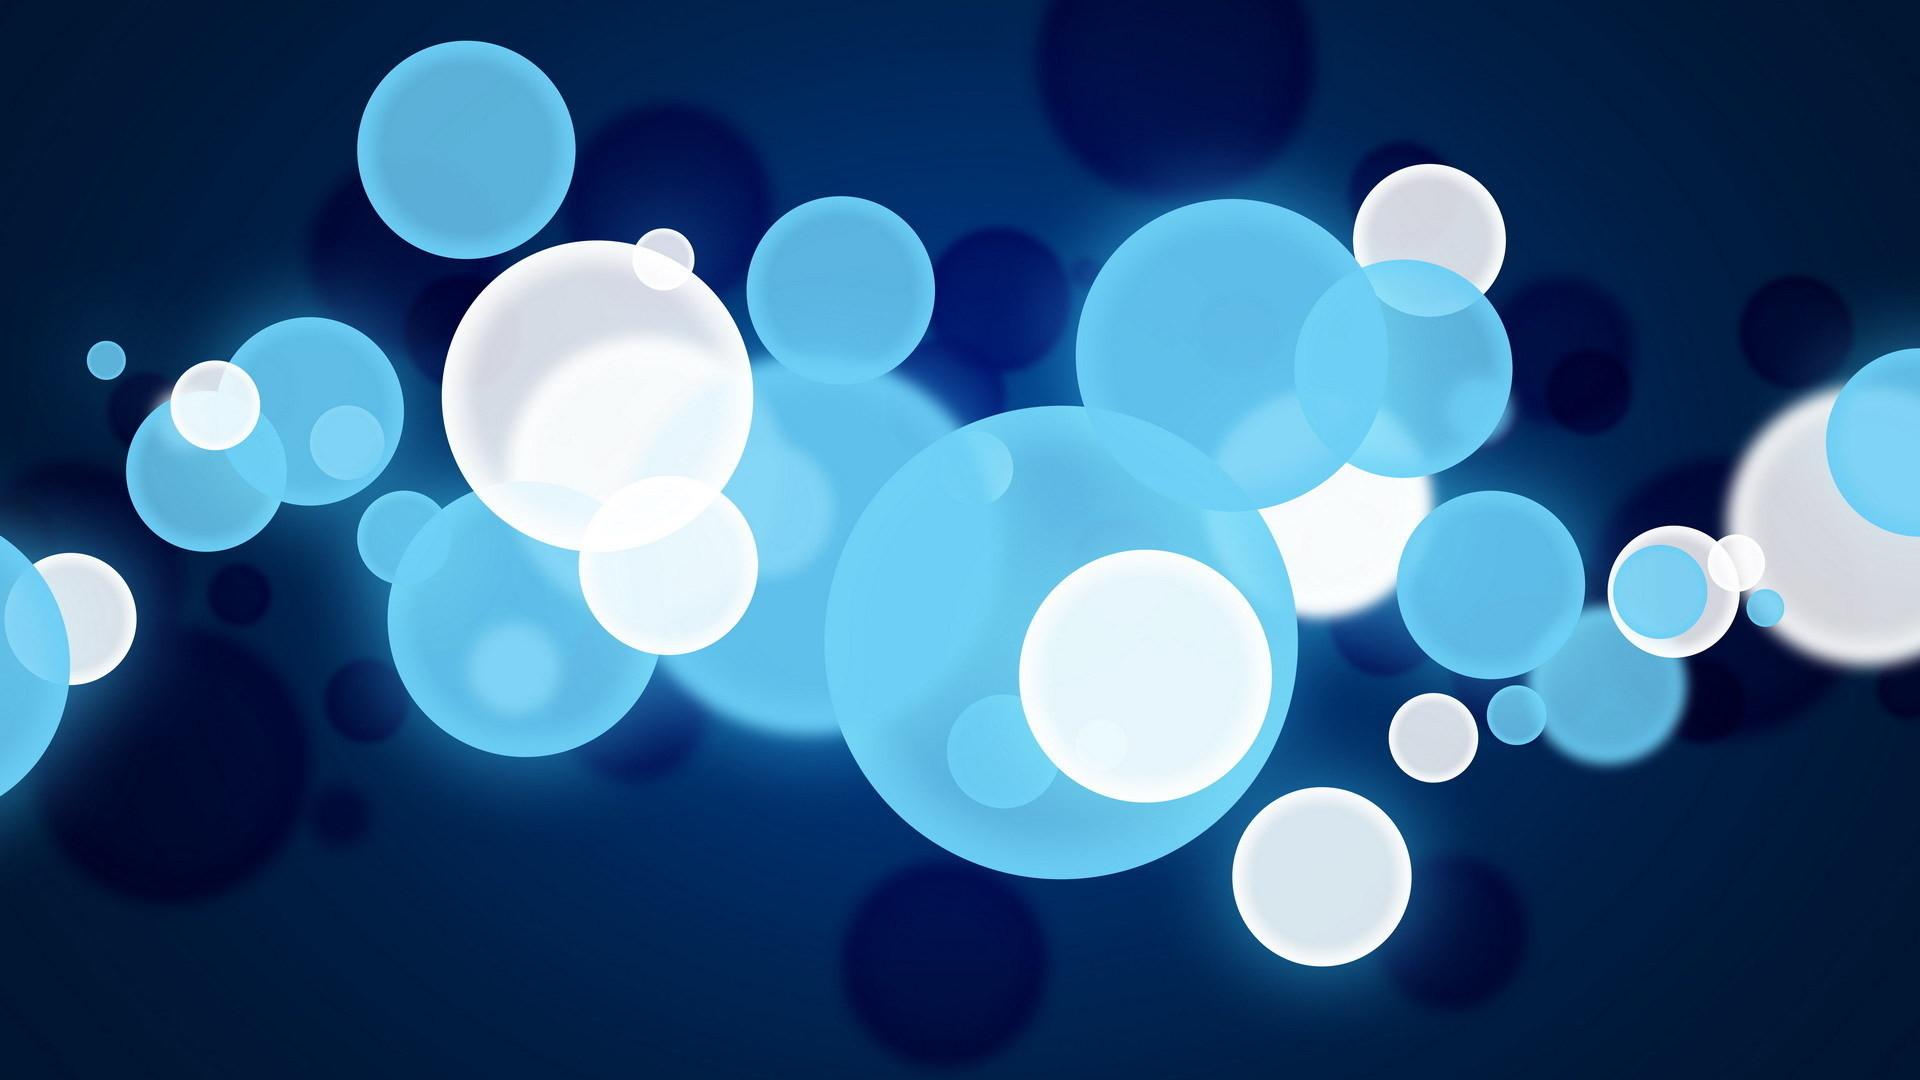 Wallpaper Dark Blue Abstract Balls Circles desktop wallpaper, Wallpaper  Dark Blue Abstract Balls Circles background, Wallpaper Dark Blue Abstract  Balls …